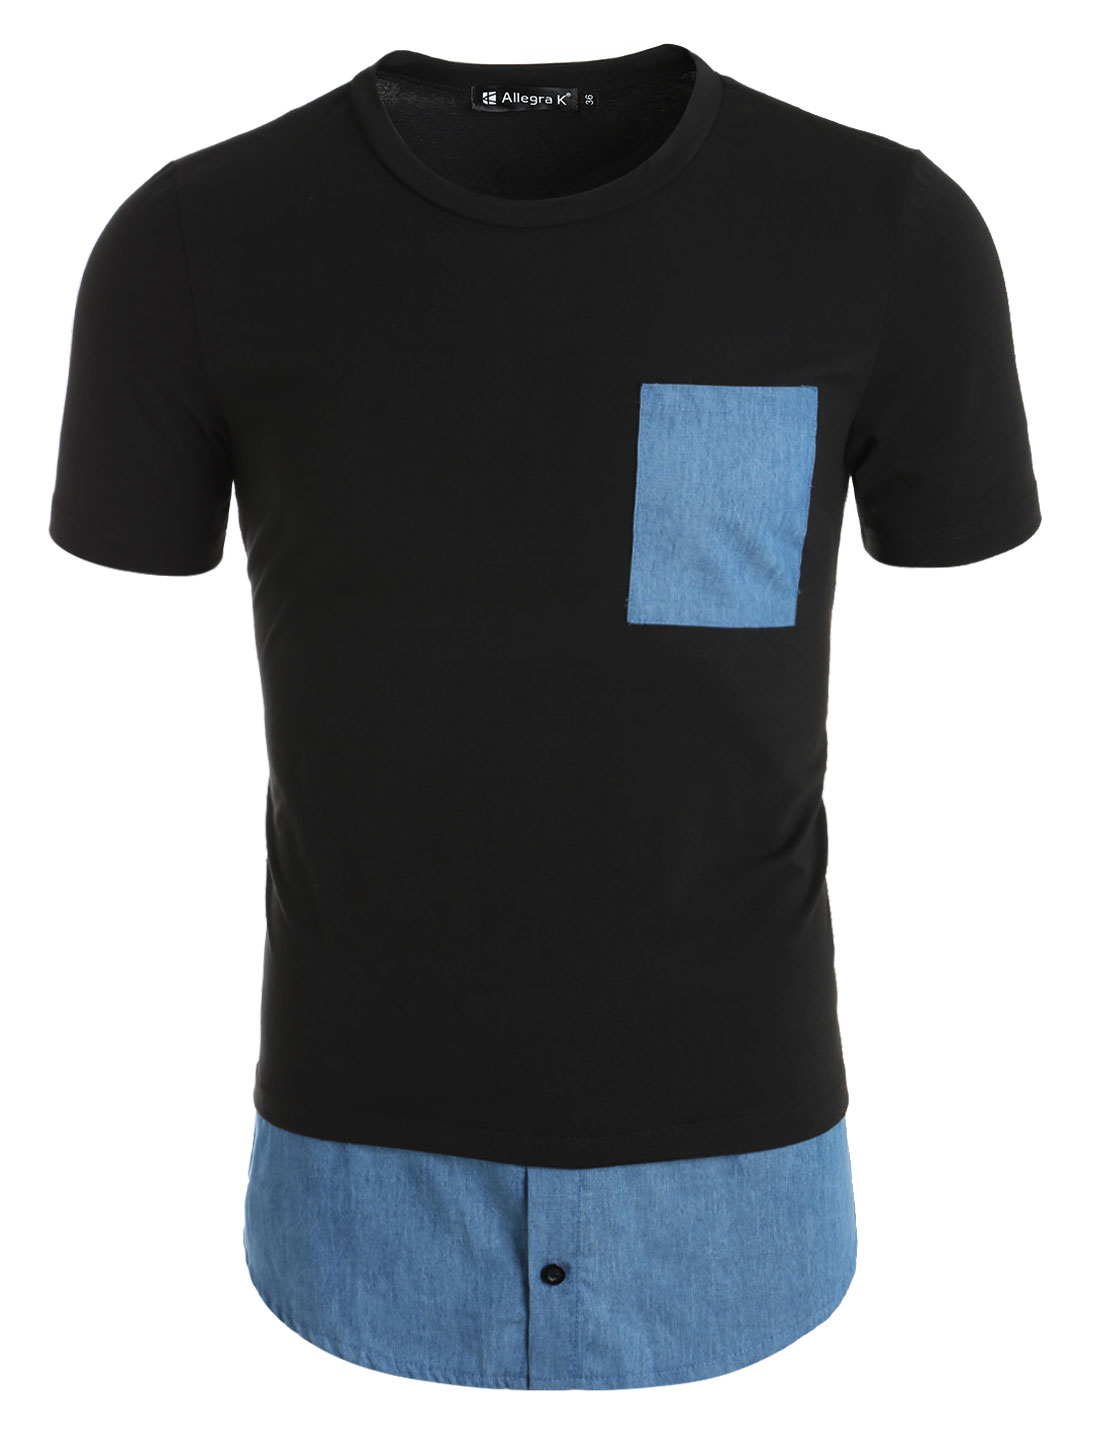 Men Chest Pocket Chambray Hem Short Sleeves Longline Tee Shirt Black S